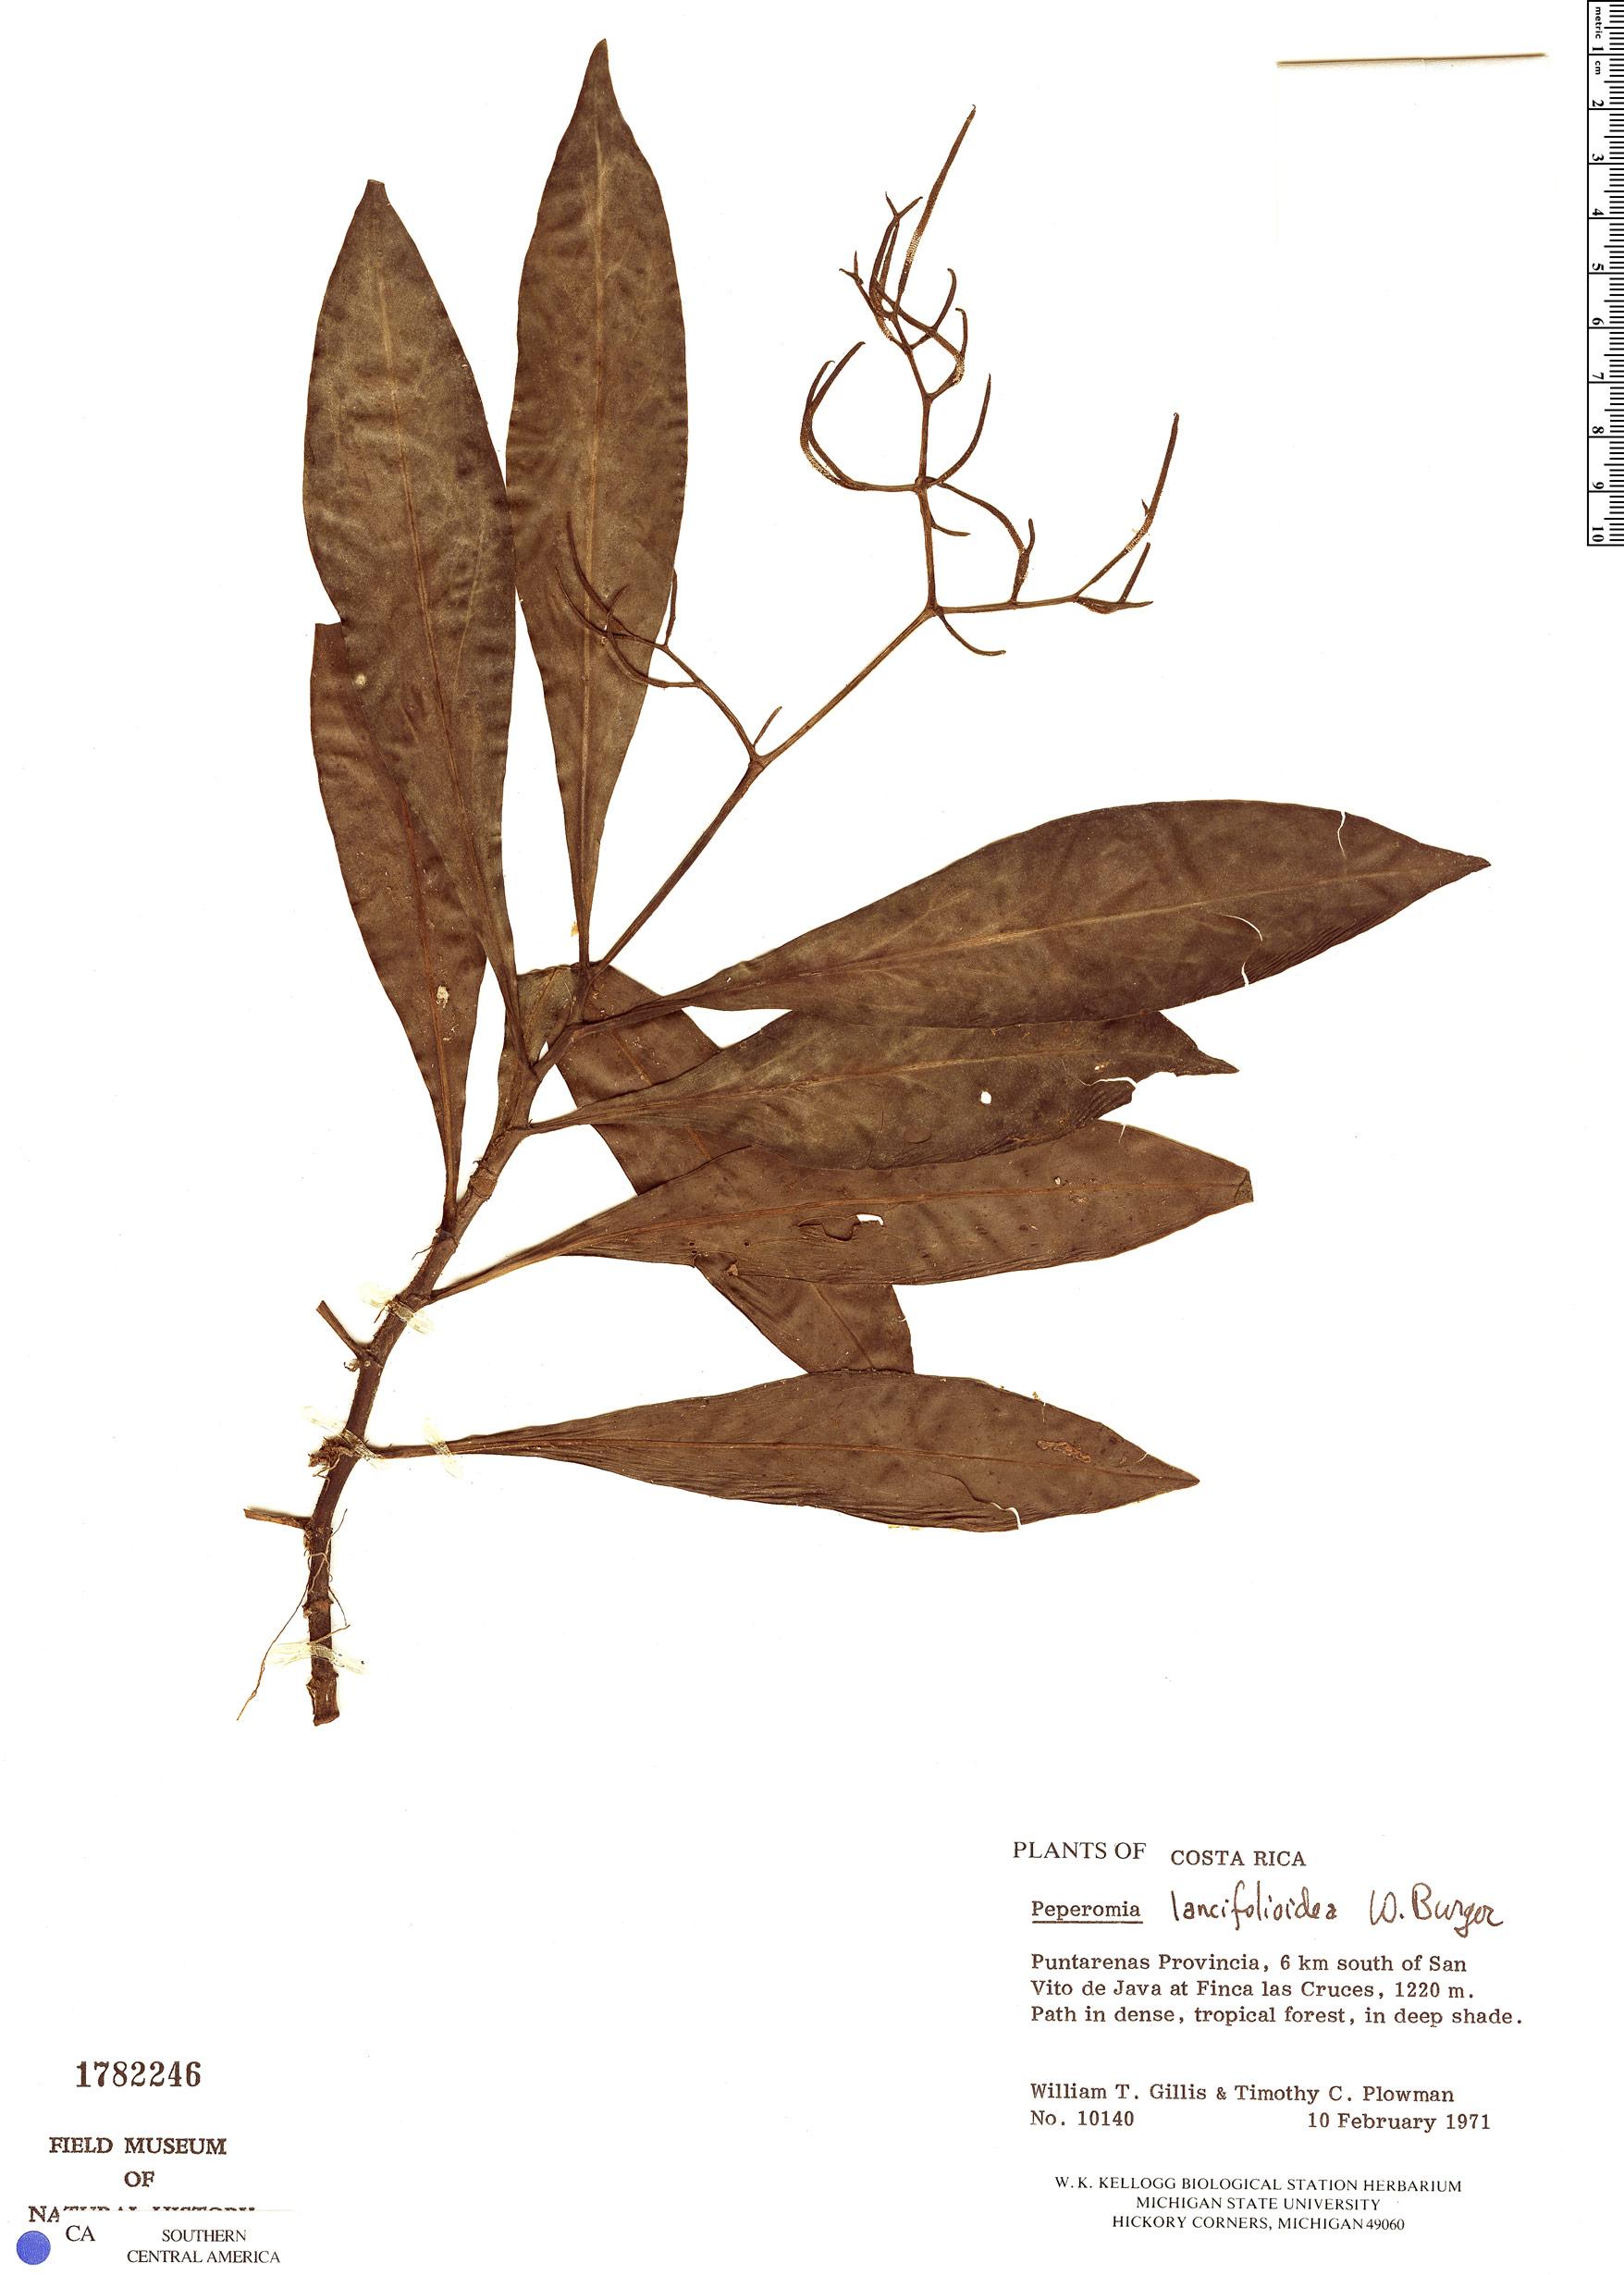 Specimen: Peperomia lancifolioidea